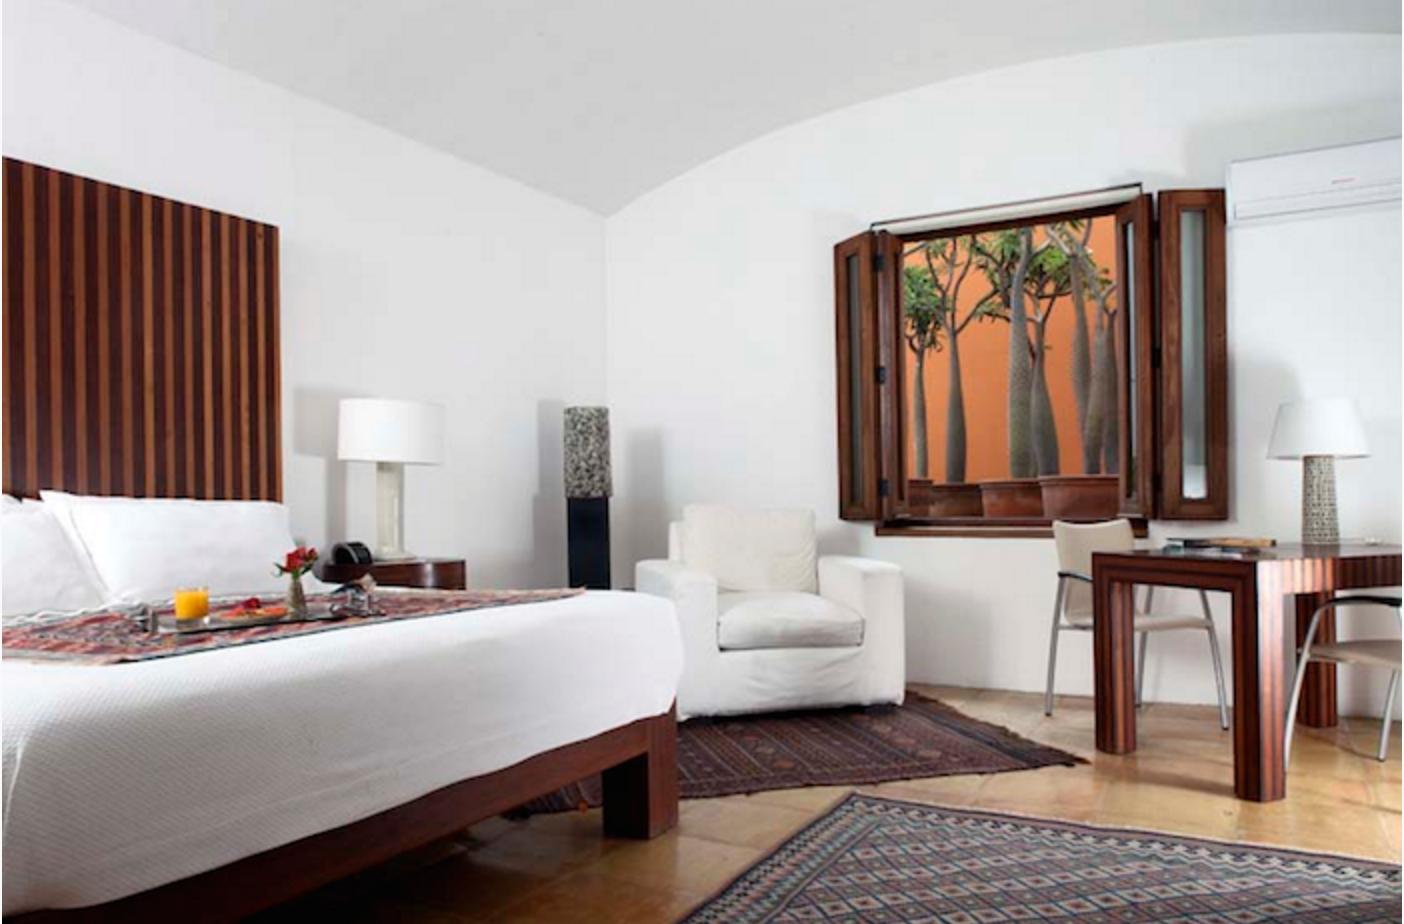 14. Hotel Casa Reyna